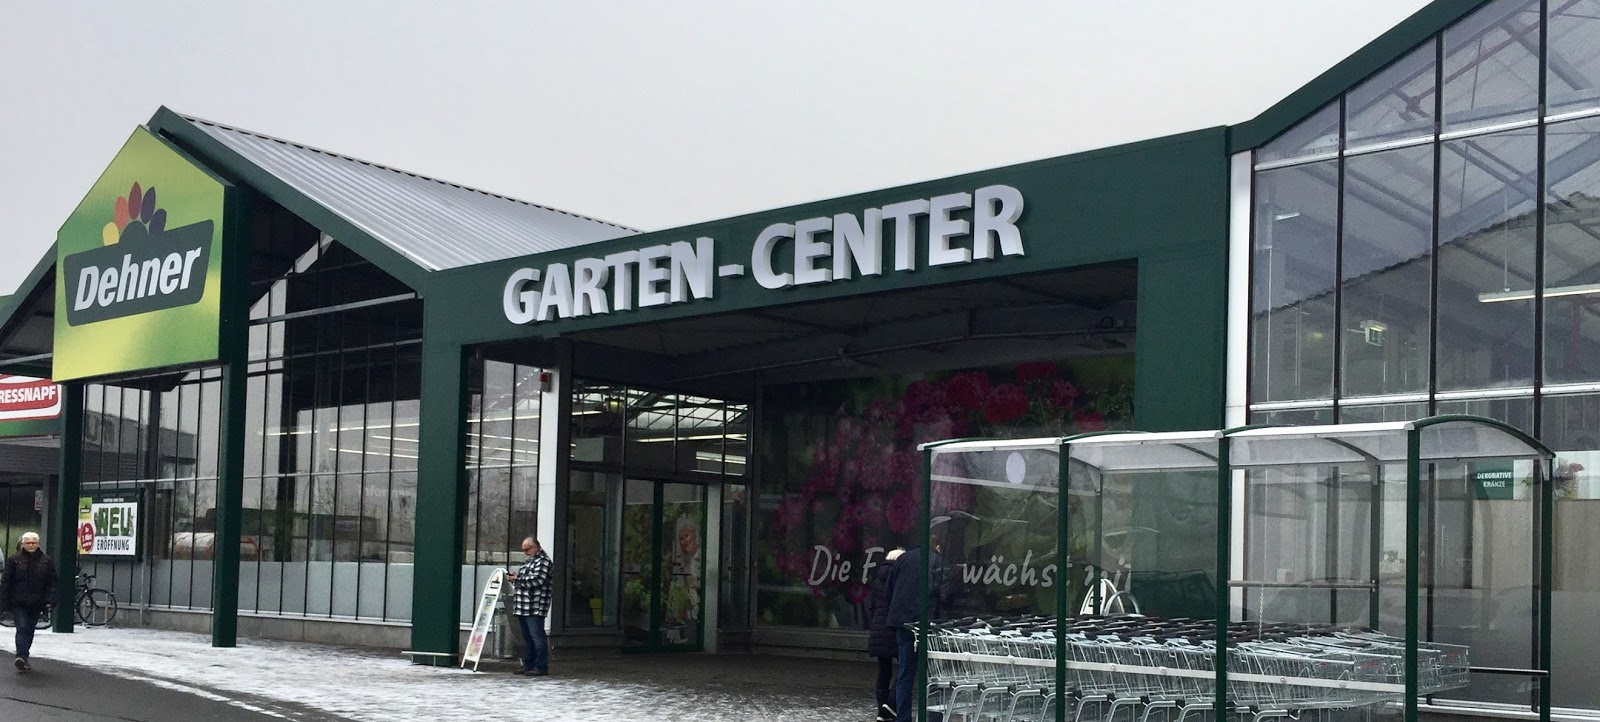 Erfurter stadtschreiber for Kleingarten erfurt